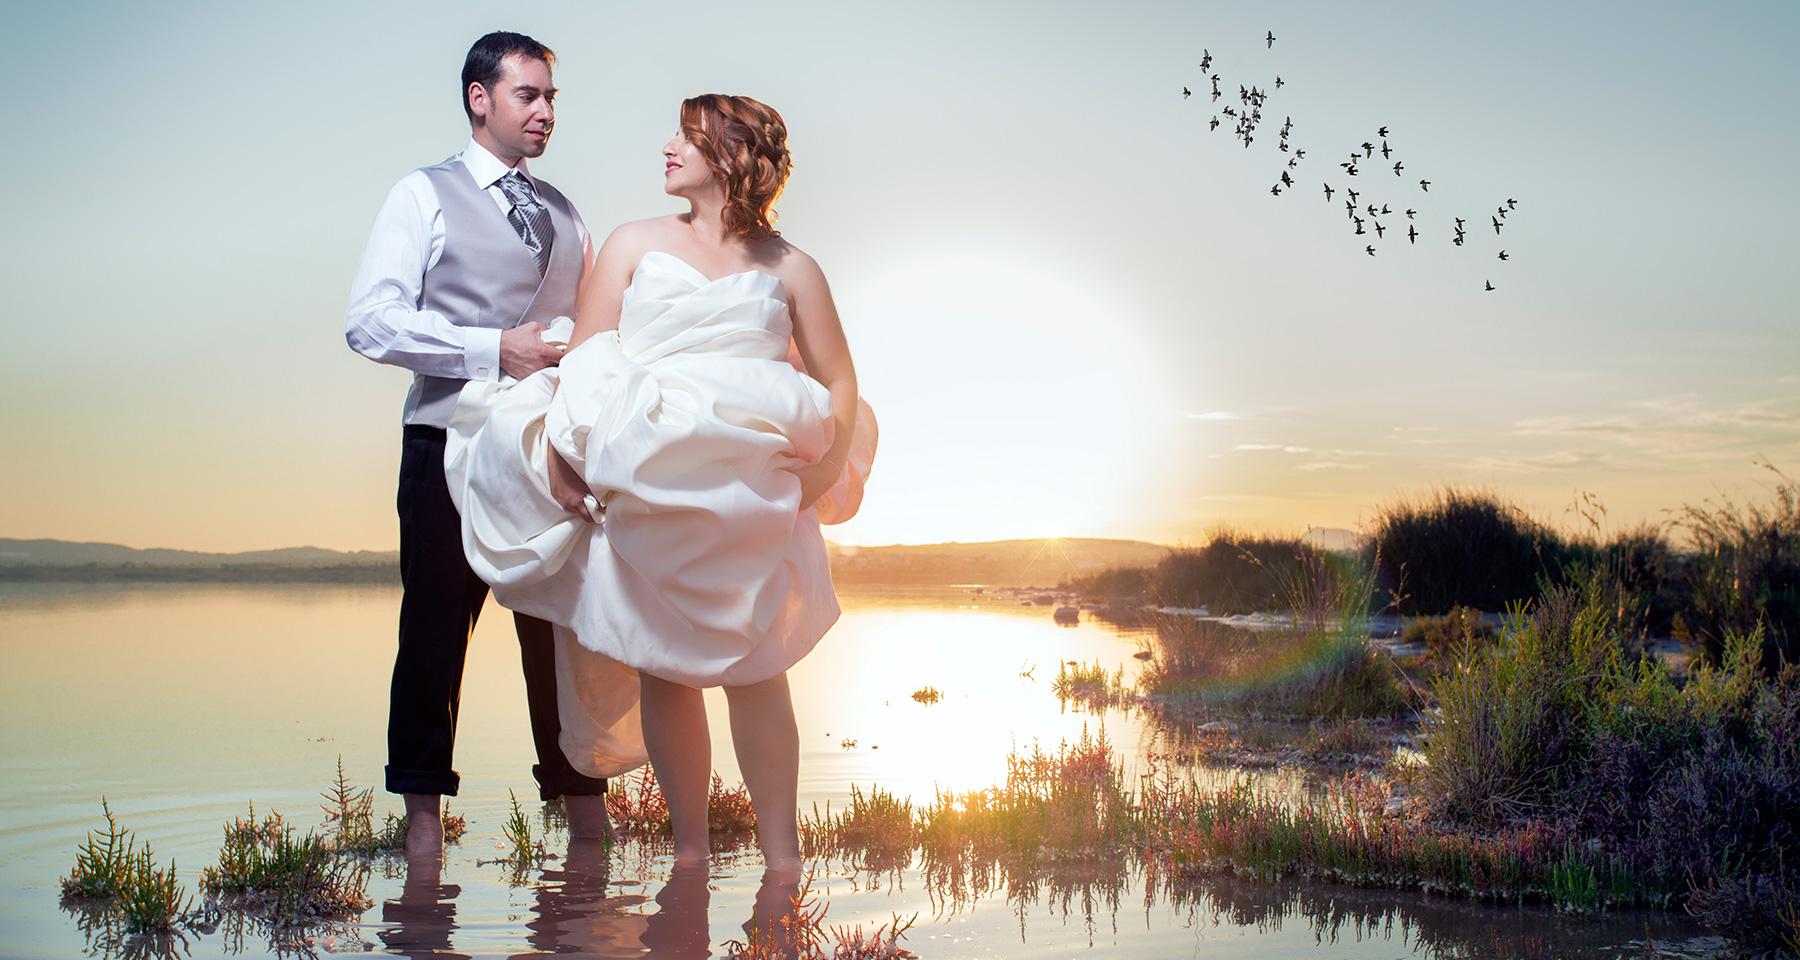 Fotografo-de-bodas-Alicante